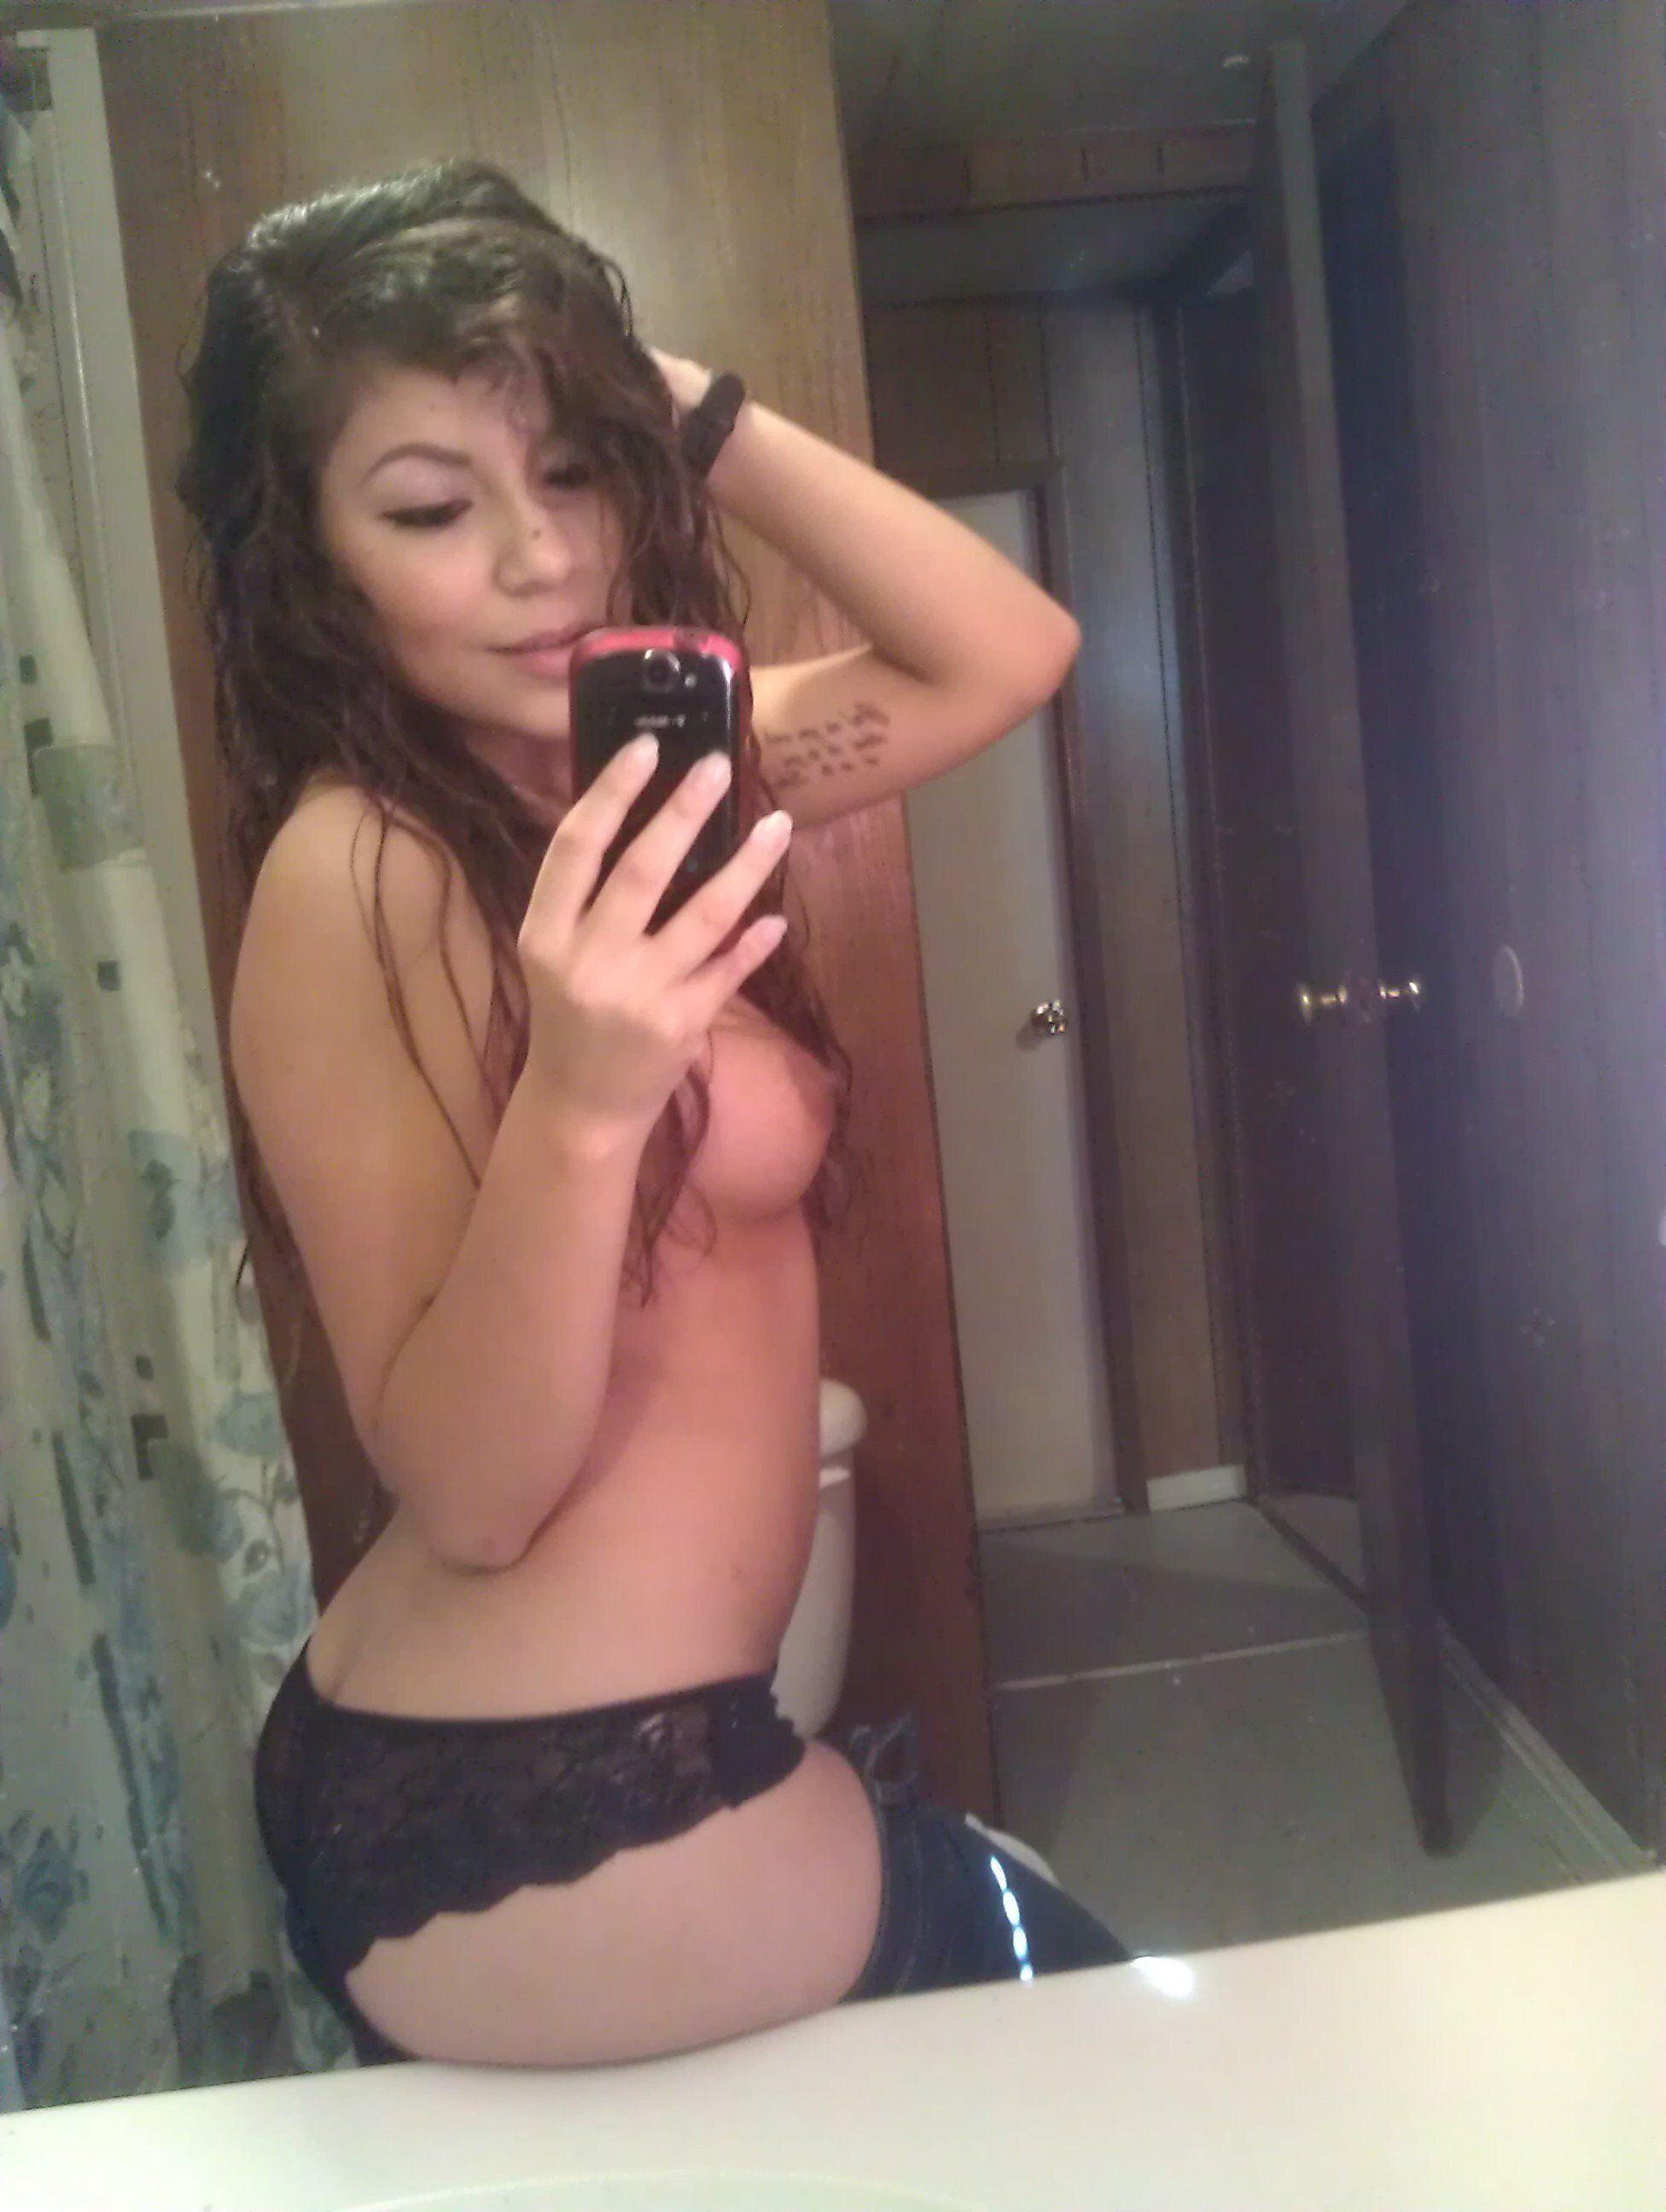 PB&J recomended Hot Nude Female Ryssia